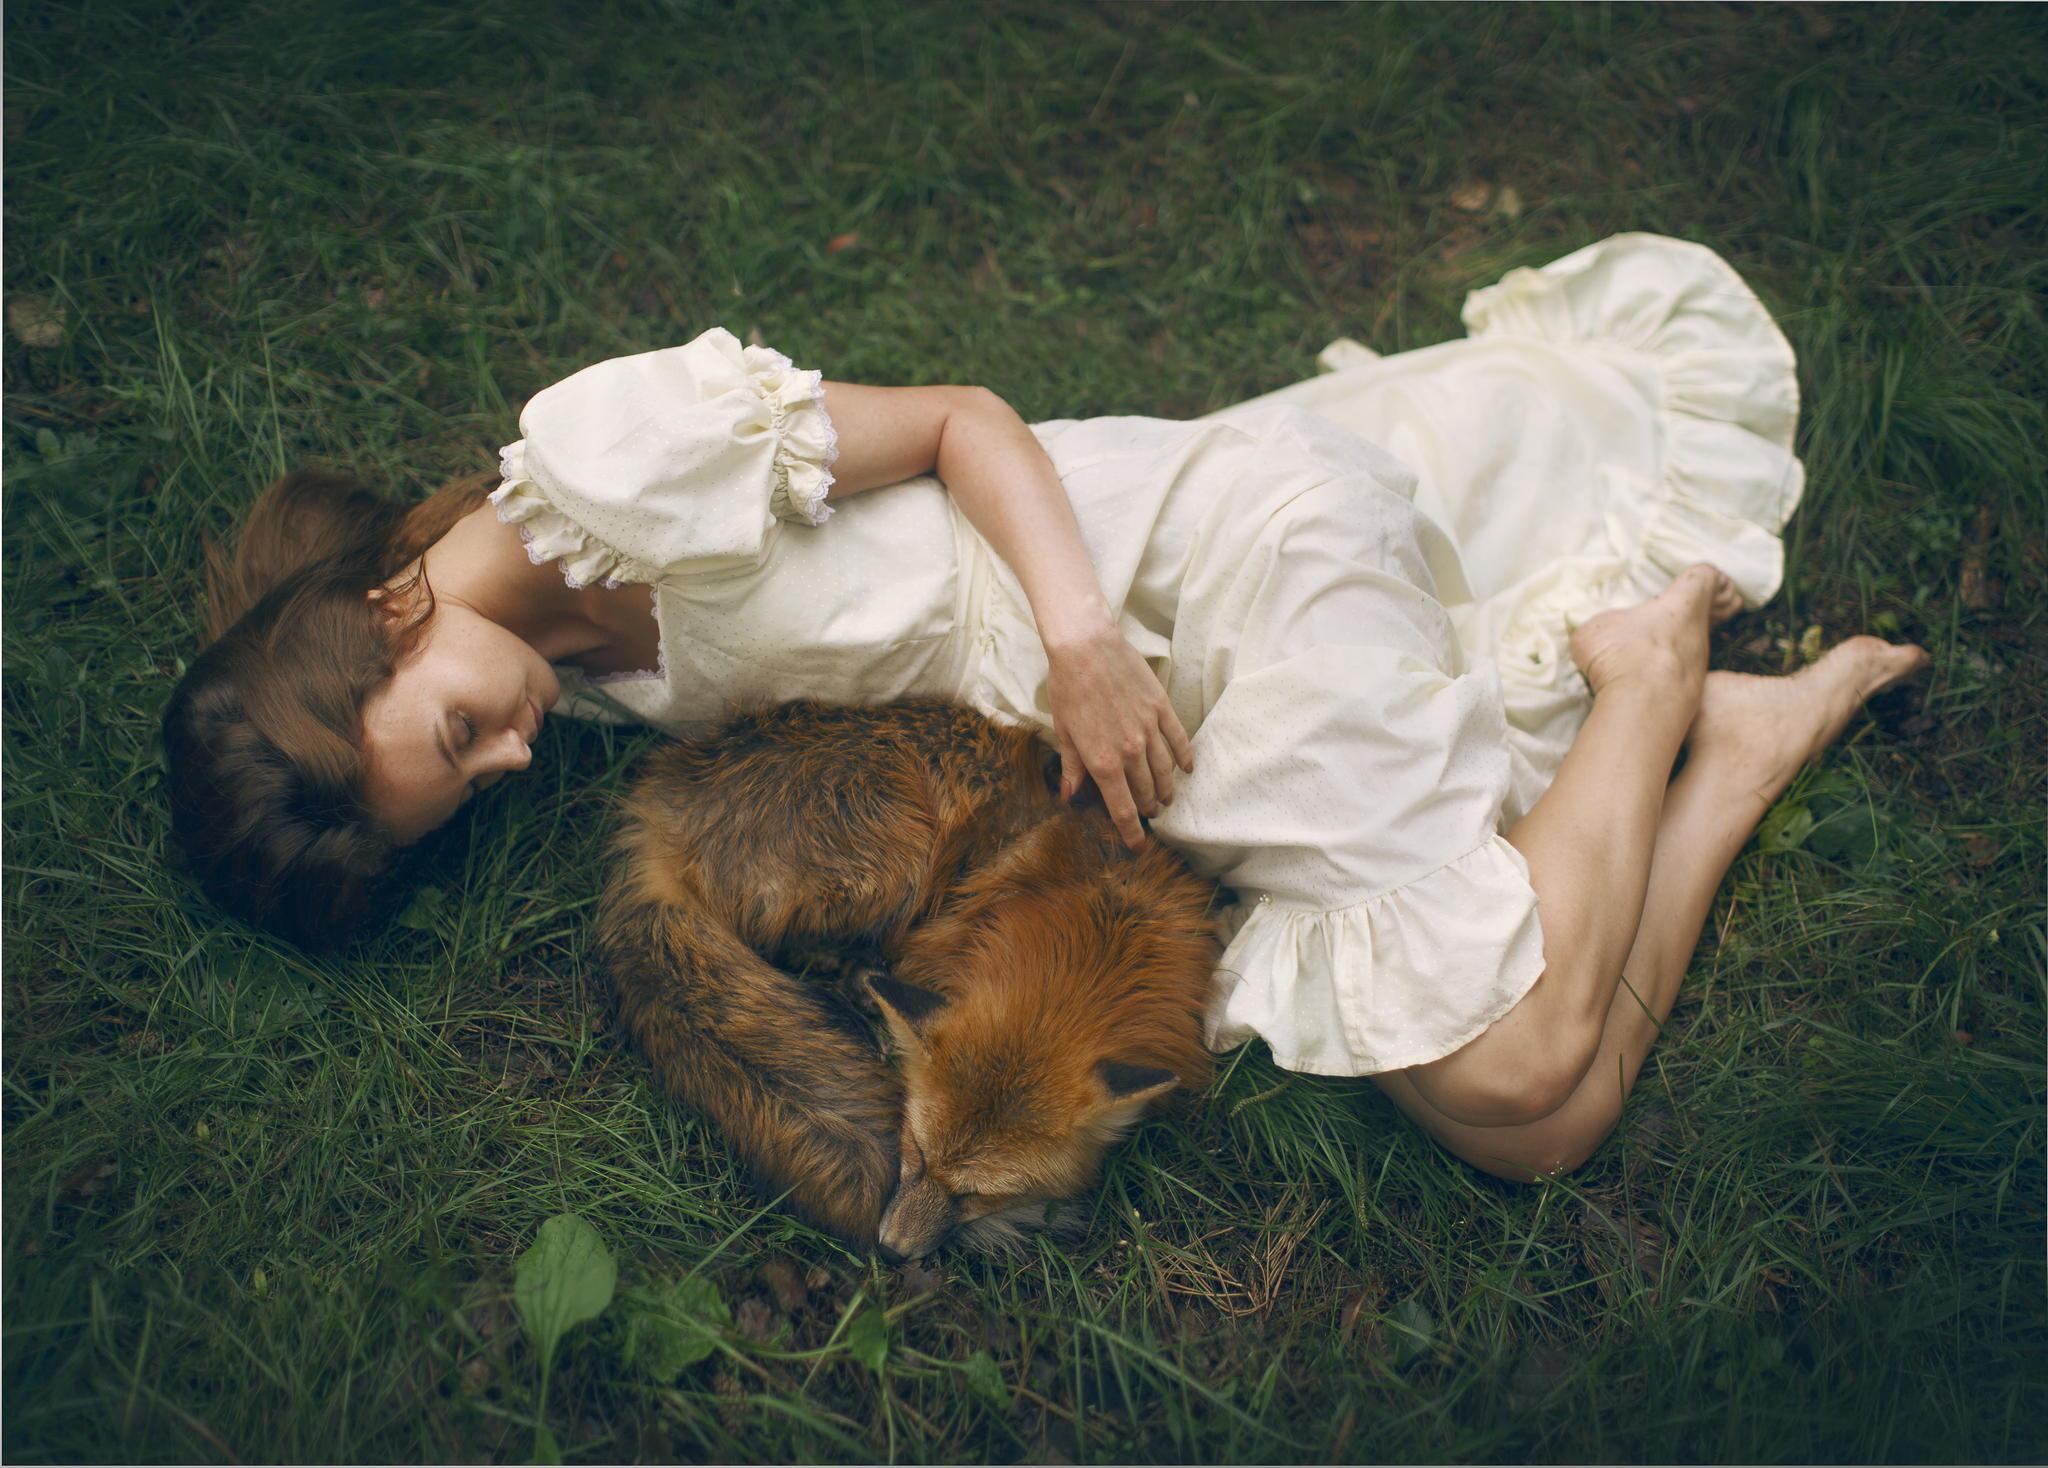 Px Blog The Passionate Photographer Community Meet The - Photographer uses photoshop to create surreal dreamy composite images